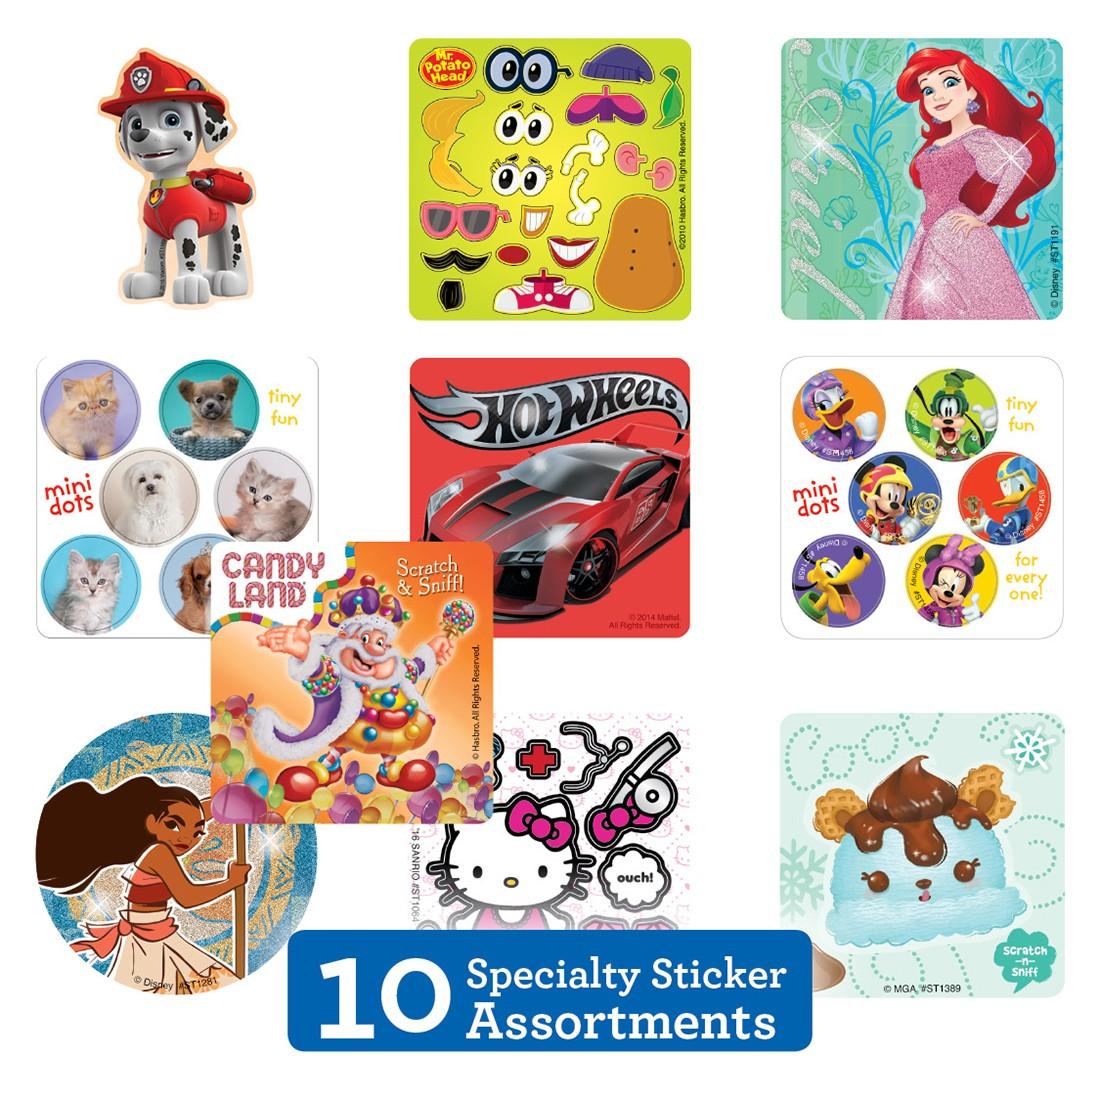 Specialty Sticker Sampler                          [image]